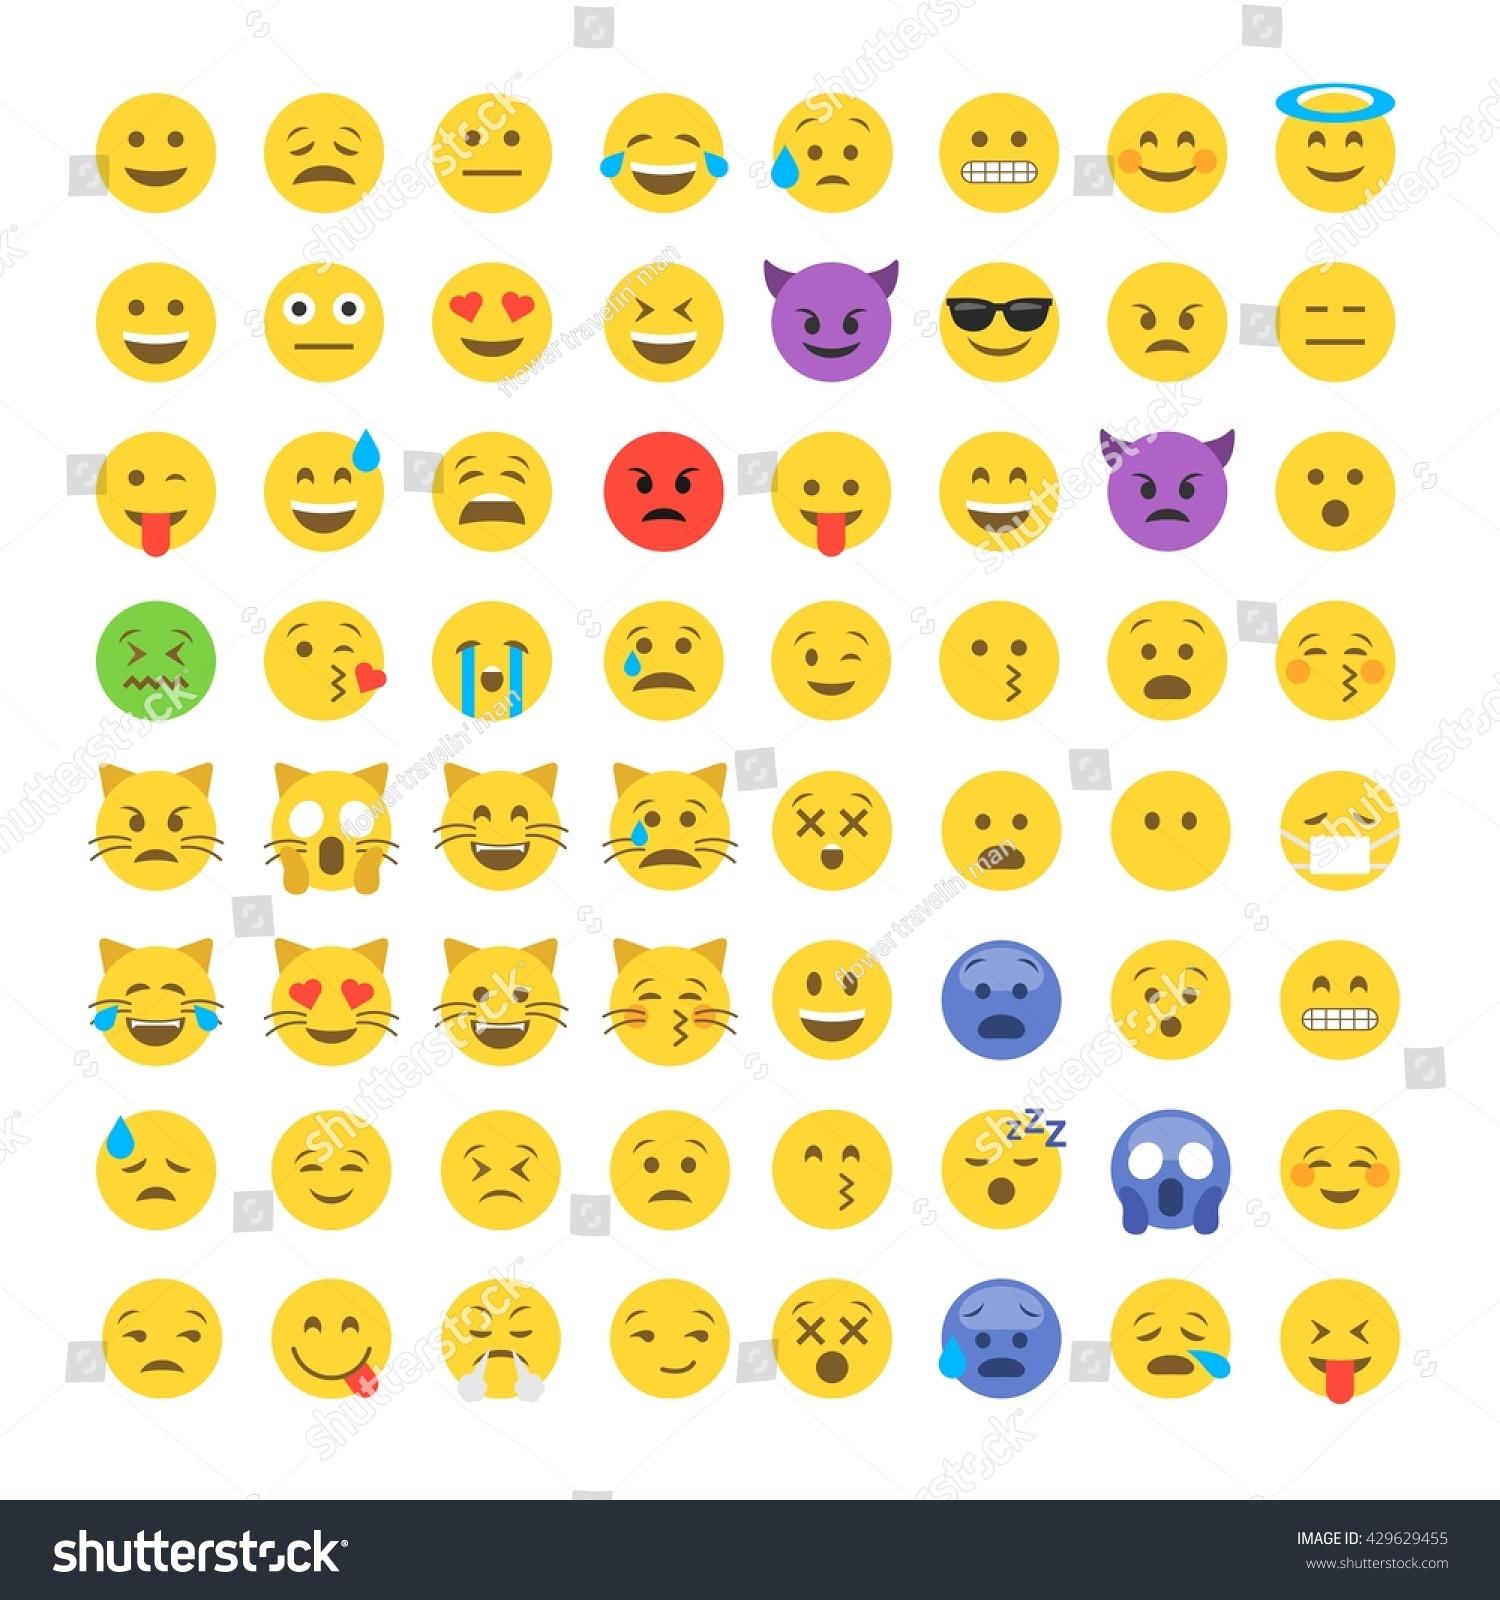 Abstract Funny Flat Style Emoji Emoticon Icon Set Stock Vector Illustration 4